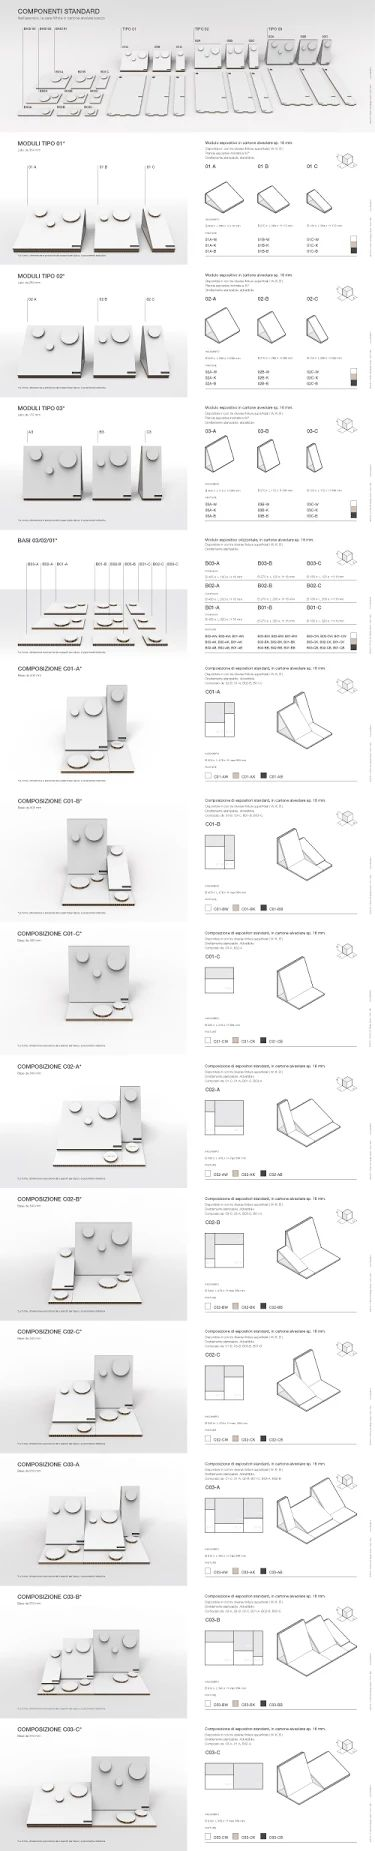 01.13 - Cardboard Exhibition System fro Bijoux - Details Design by Valerio Campisi